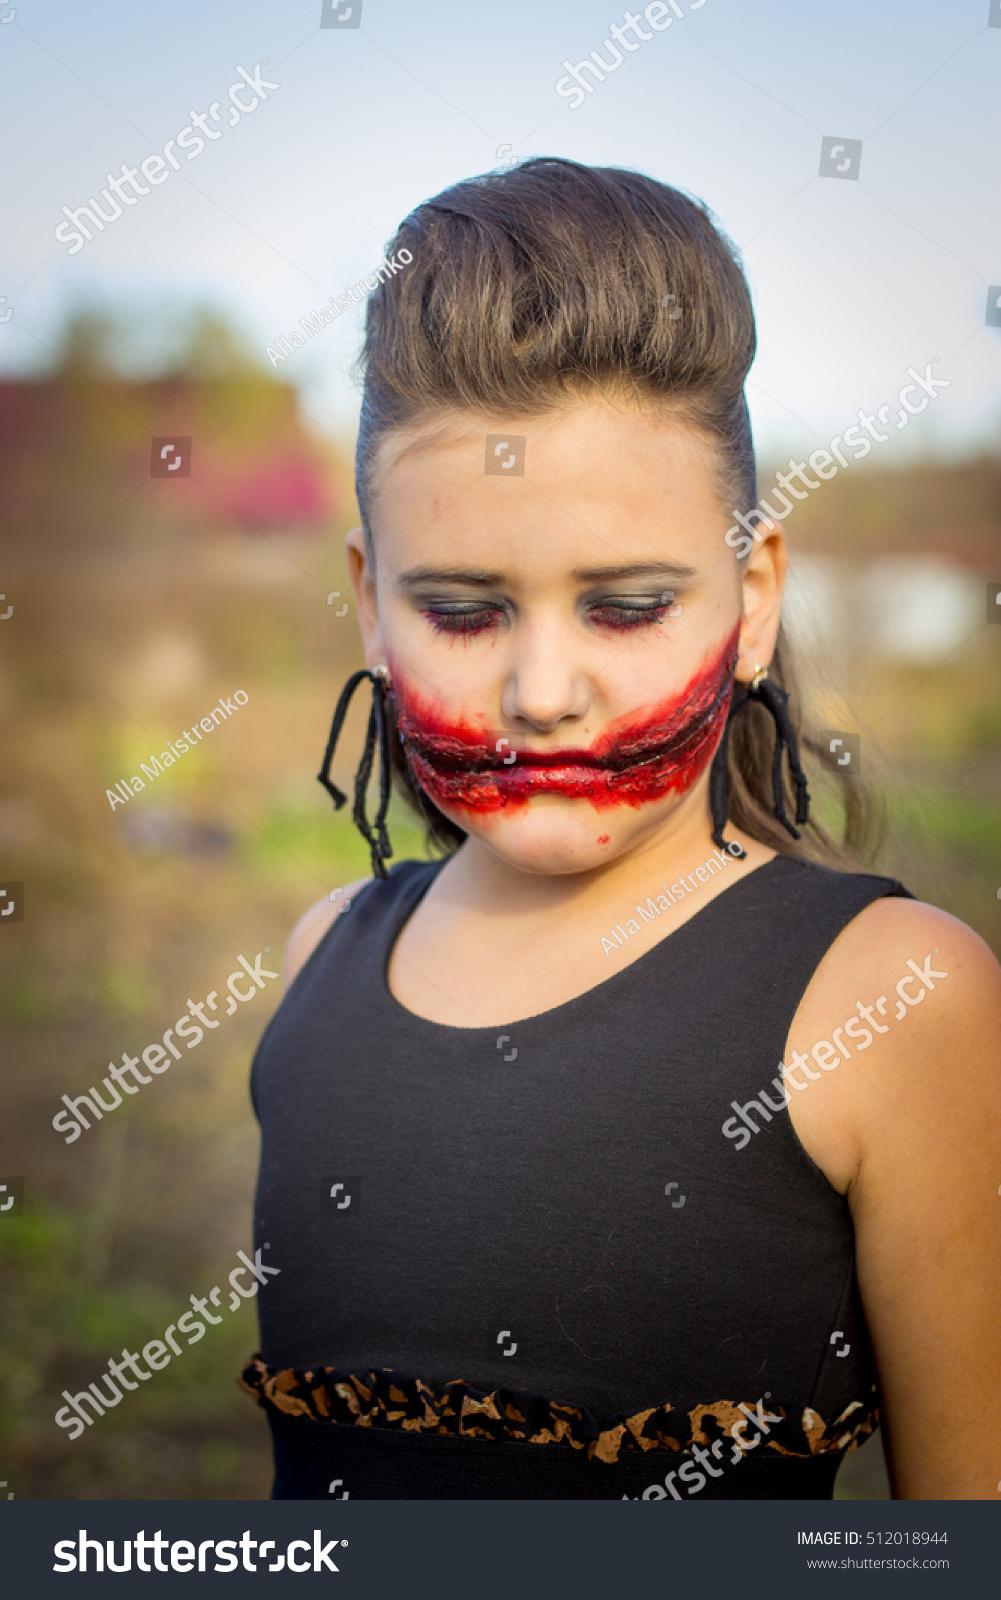 girl halloween applying makeup scary makeup stock photo (edit now